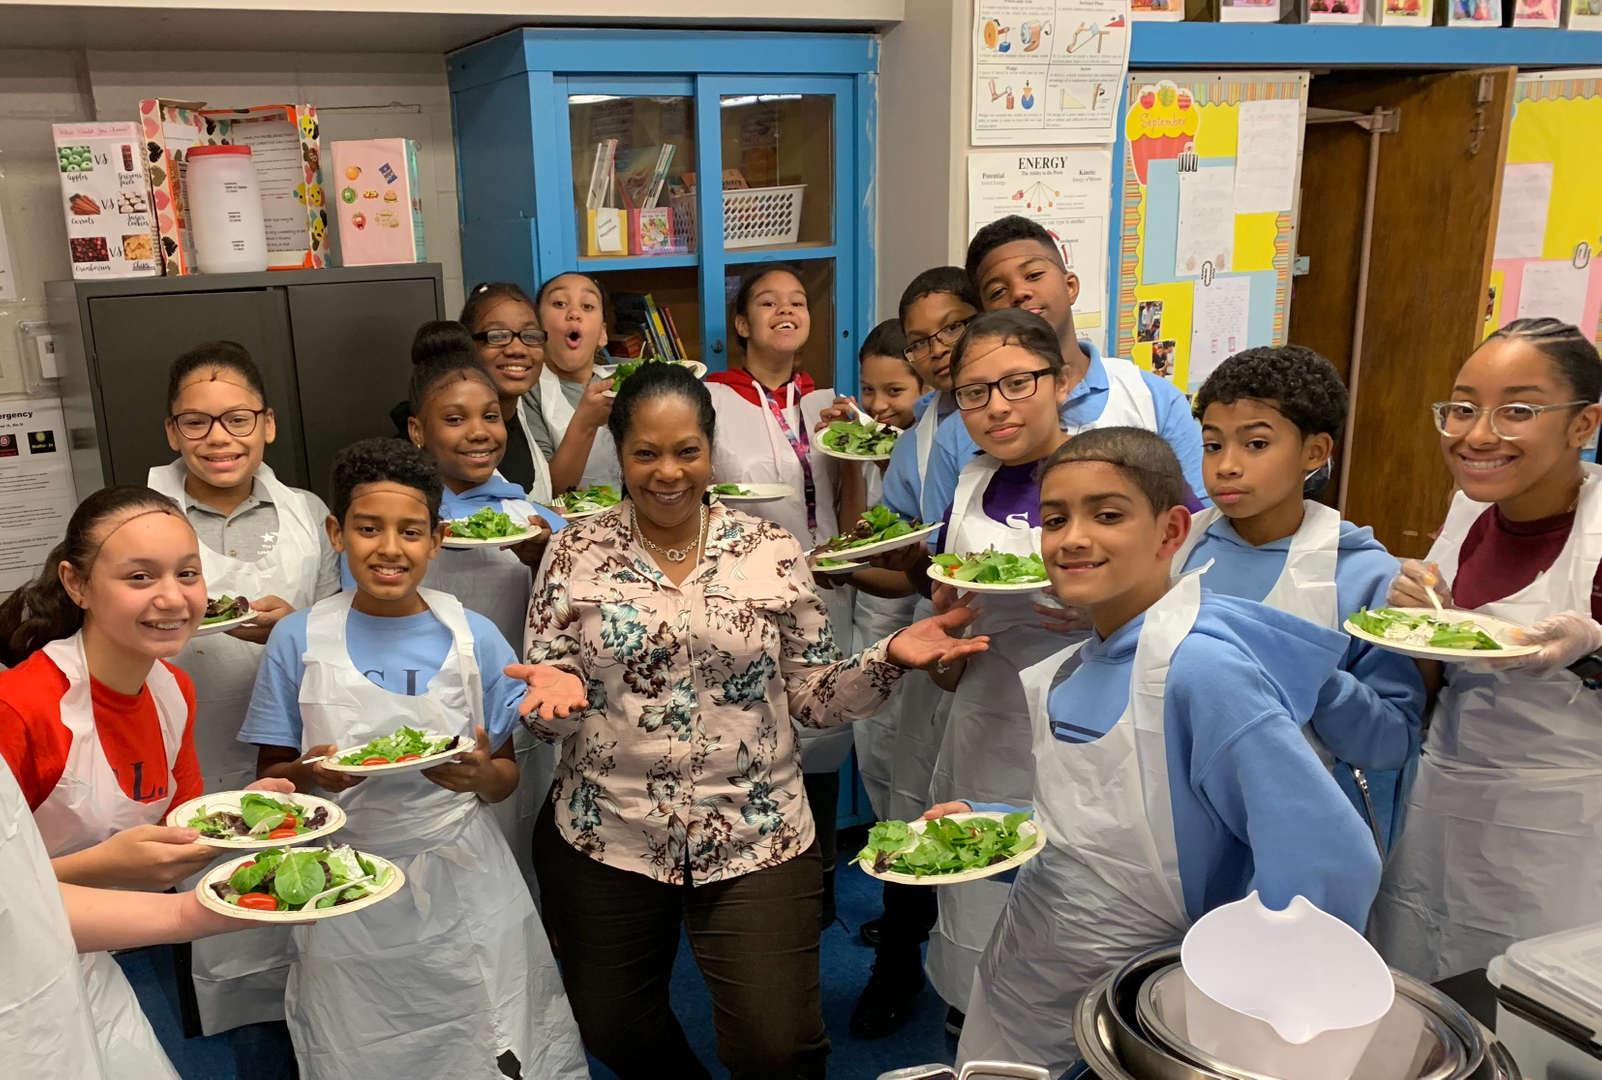 NSLA Student Chefs presenting salads